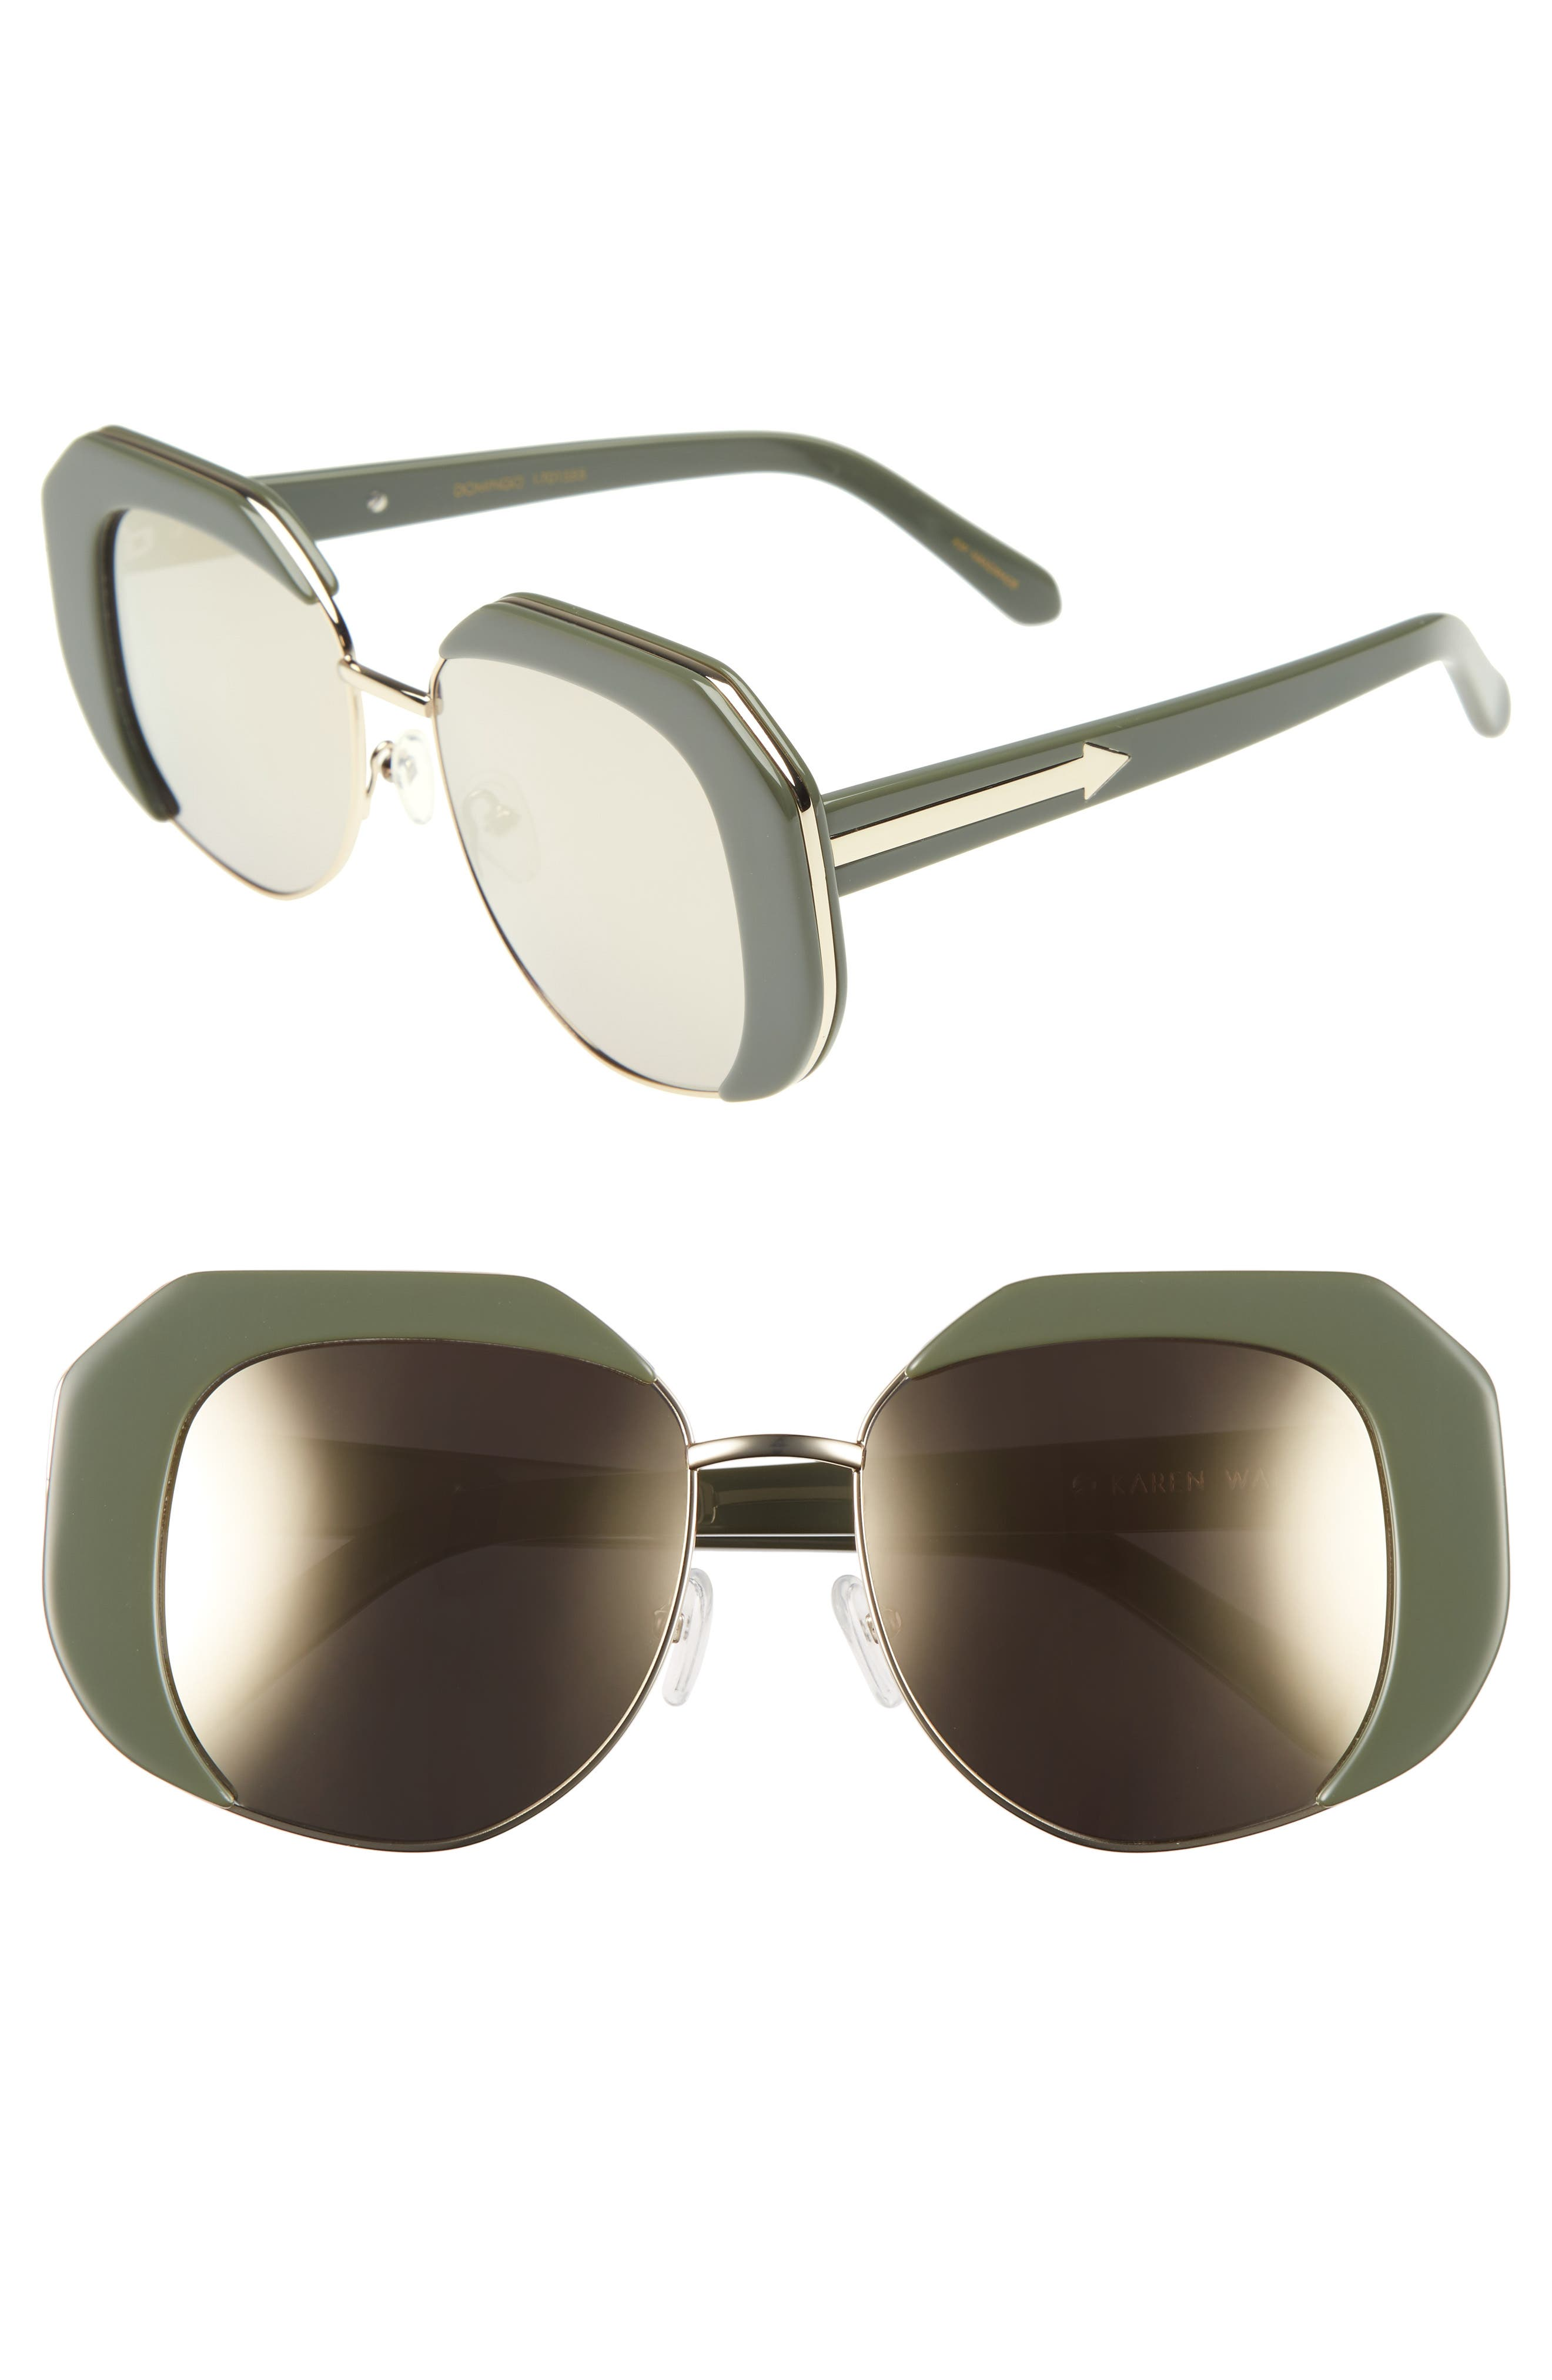 Main Image - Karen Walker Domingo 52mm Sunglasses